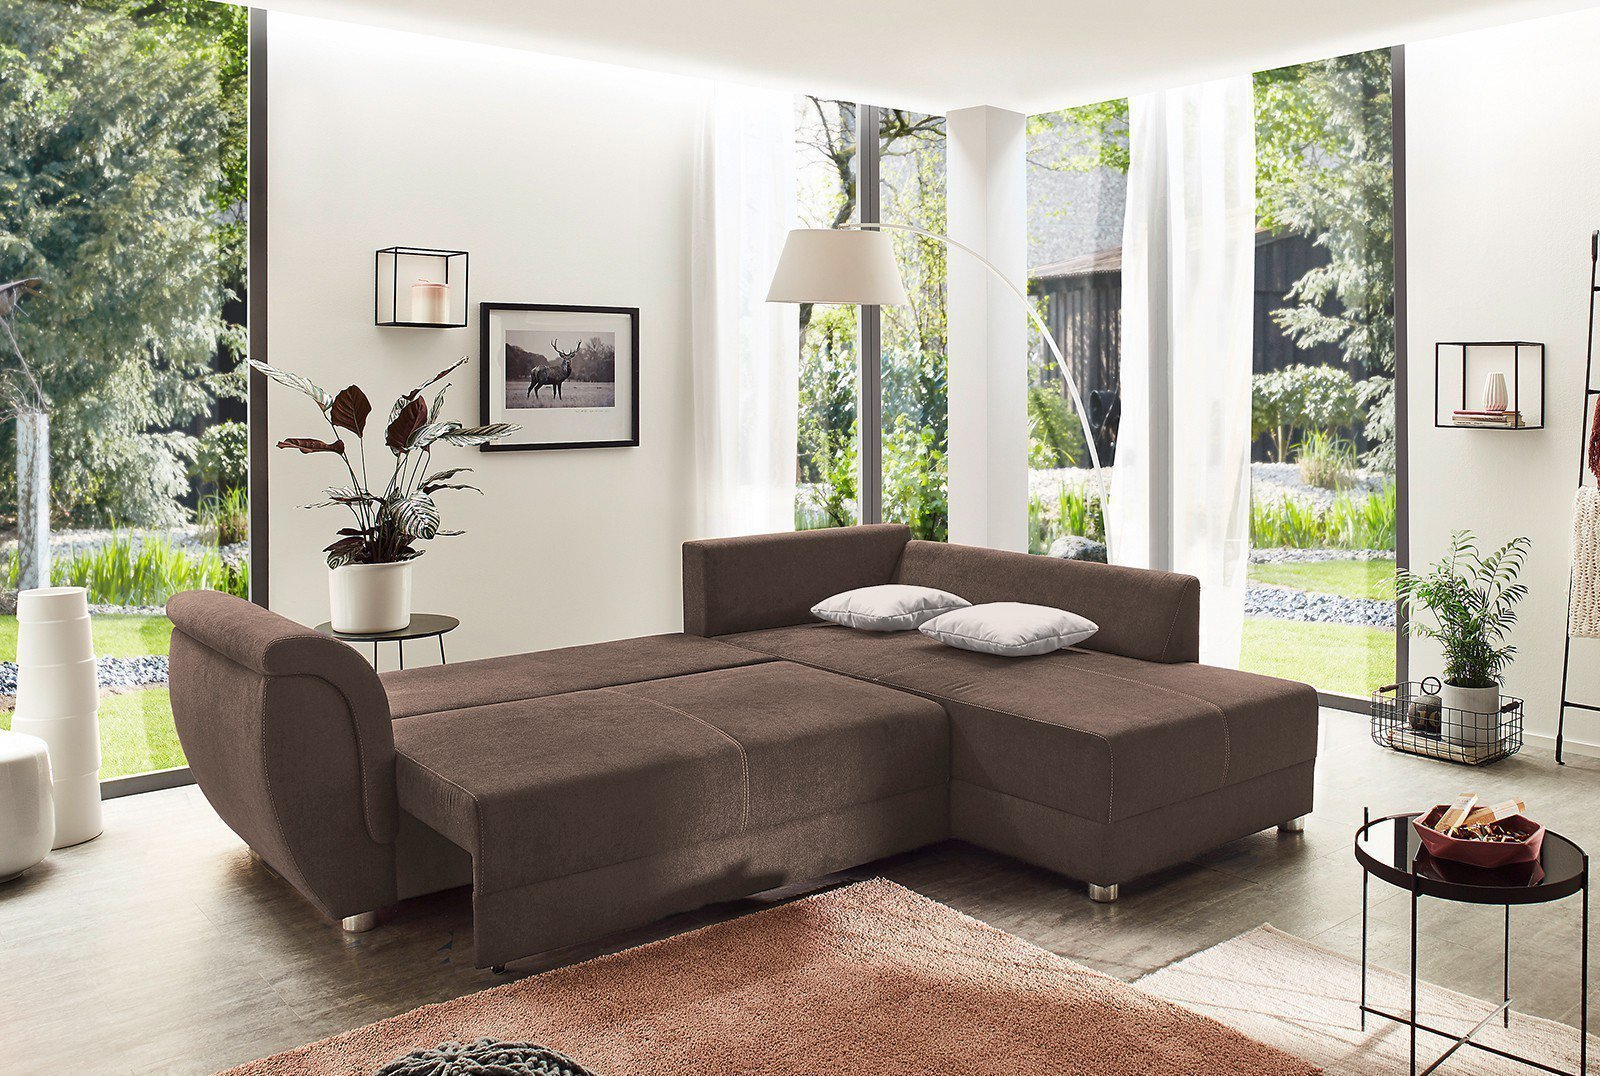 eckcouch angebot ecksofa stoff grn eckcouch kolonial. Black Bedroom Furniture Sets. Home Design Ideas